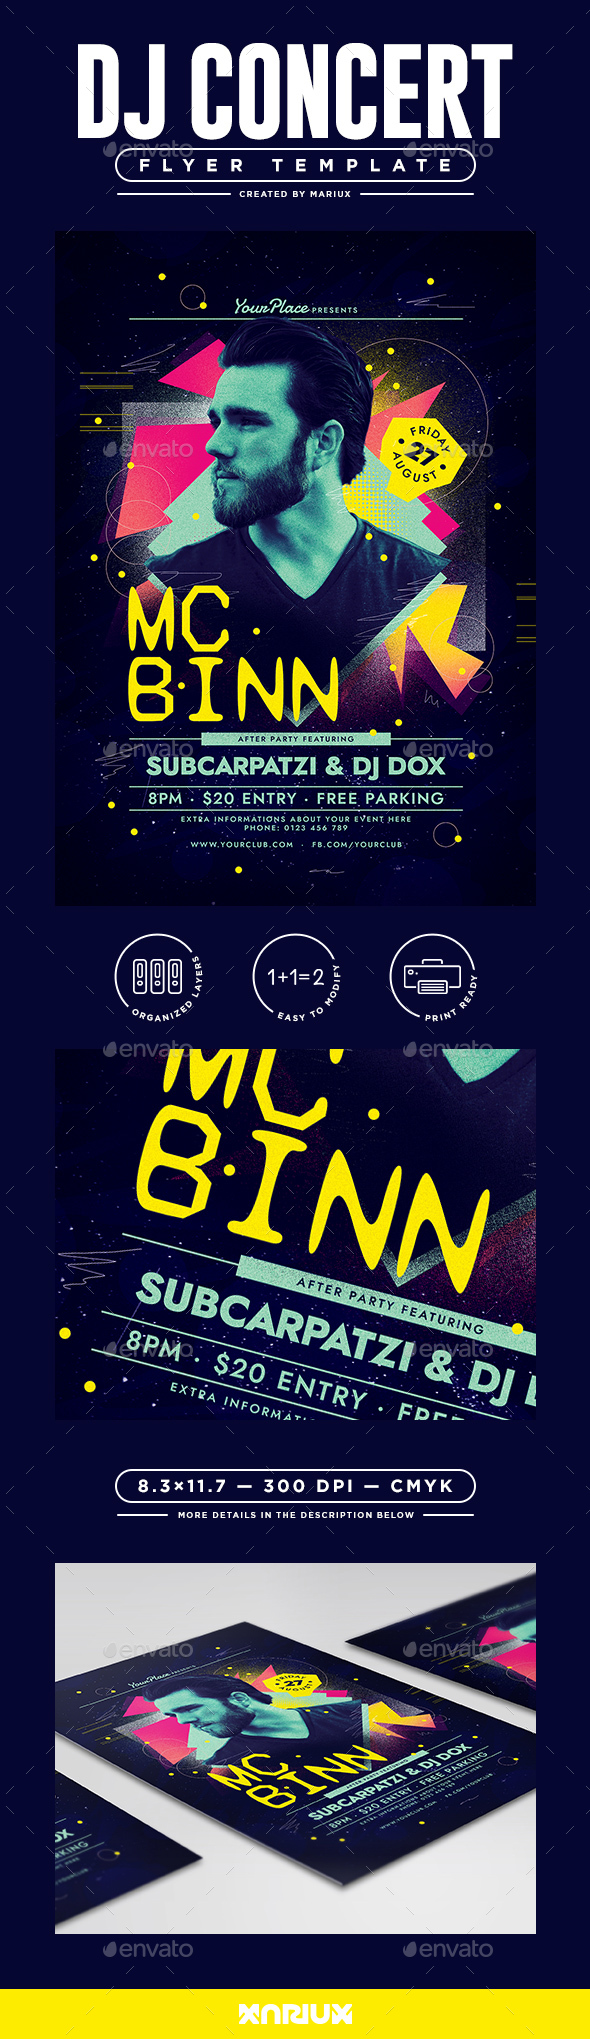 DJ Concert Flyer Template - Clubs & Parties Events